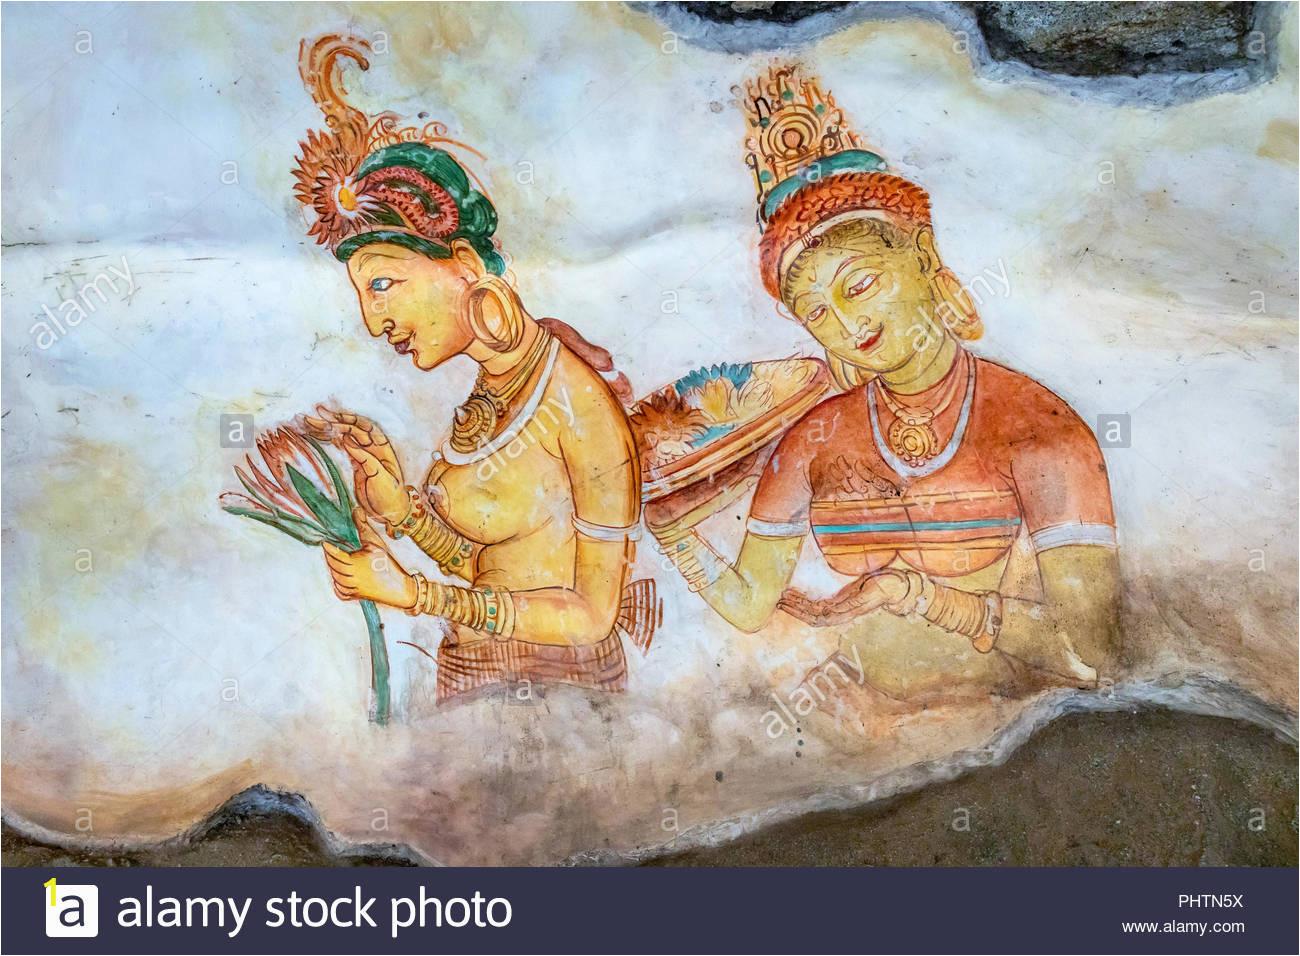 replica of the famous wall paintings at sigiriya sigiriya museum sigiriya sri lanka PHTN5X